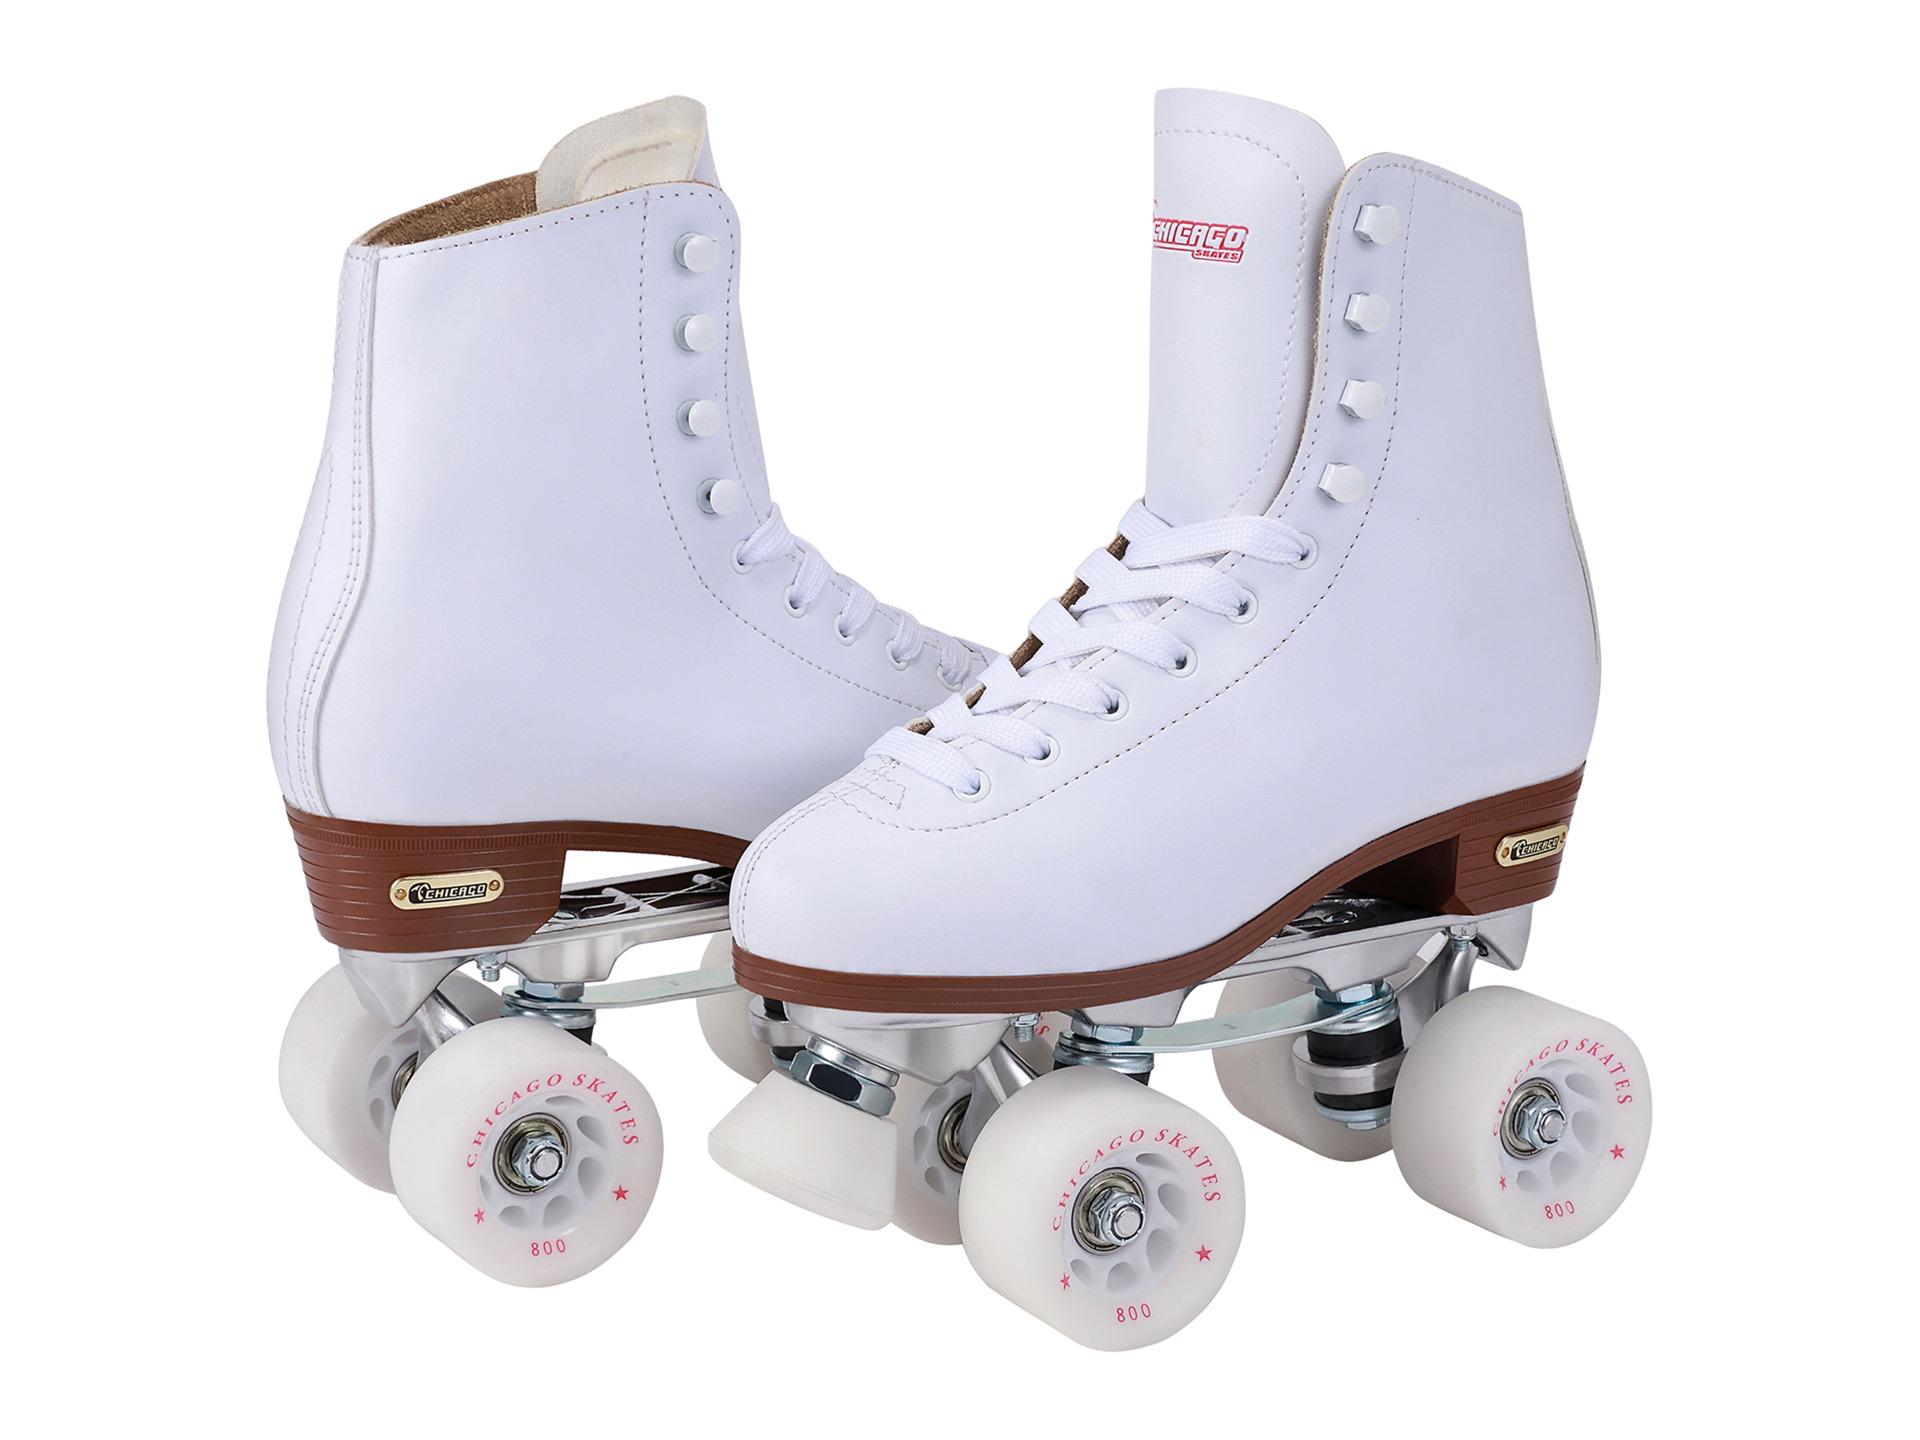 Roller skates las vegas - Video